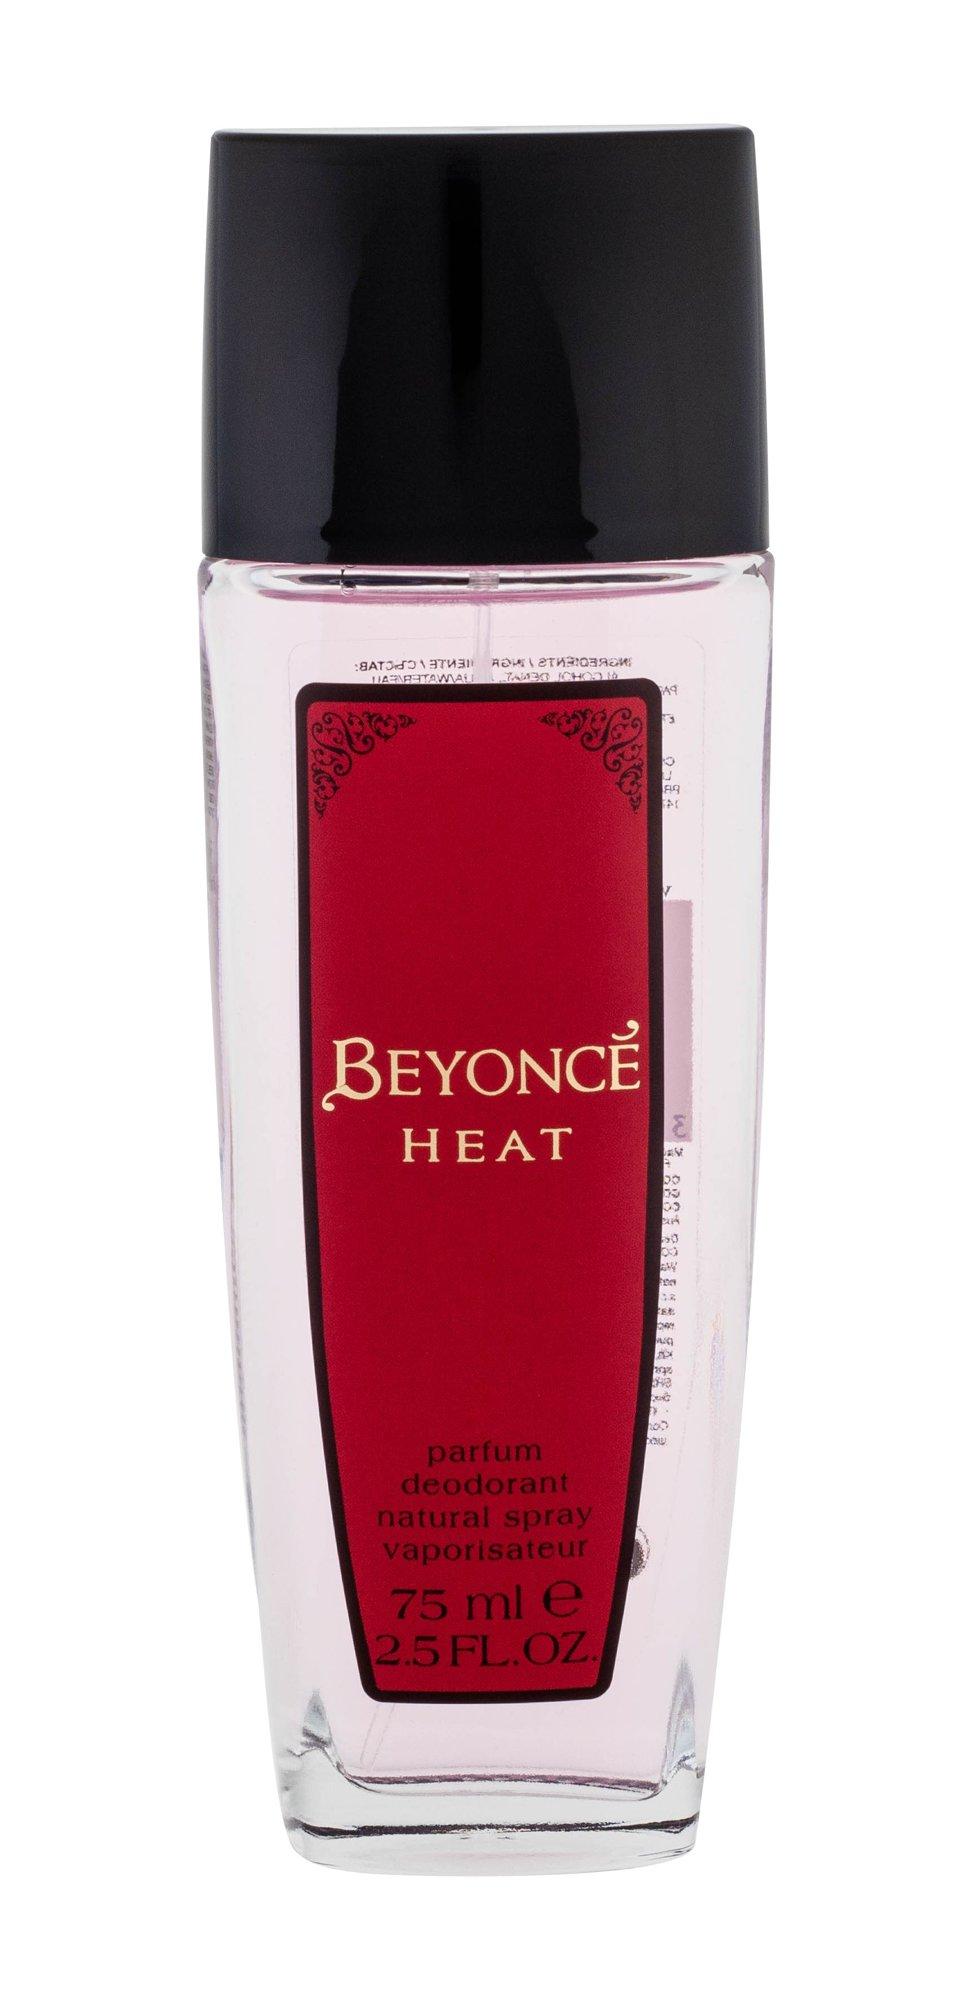 Beyonce Heat Deodorant 75ml